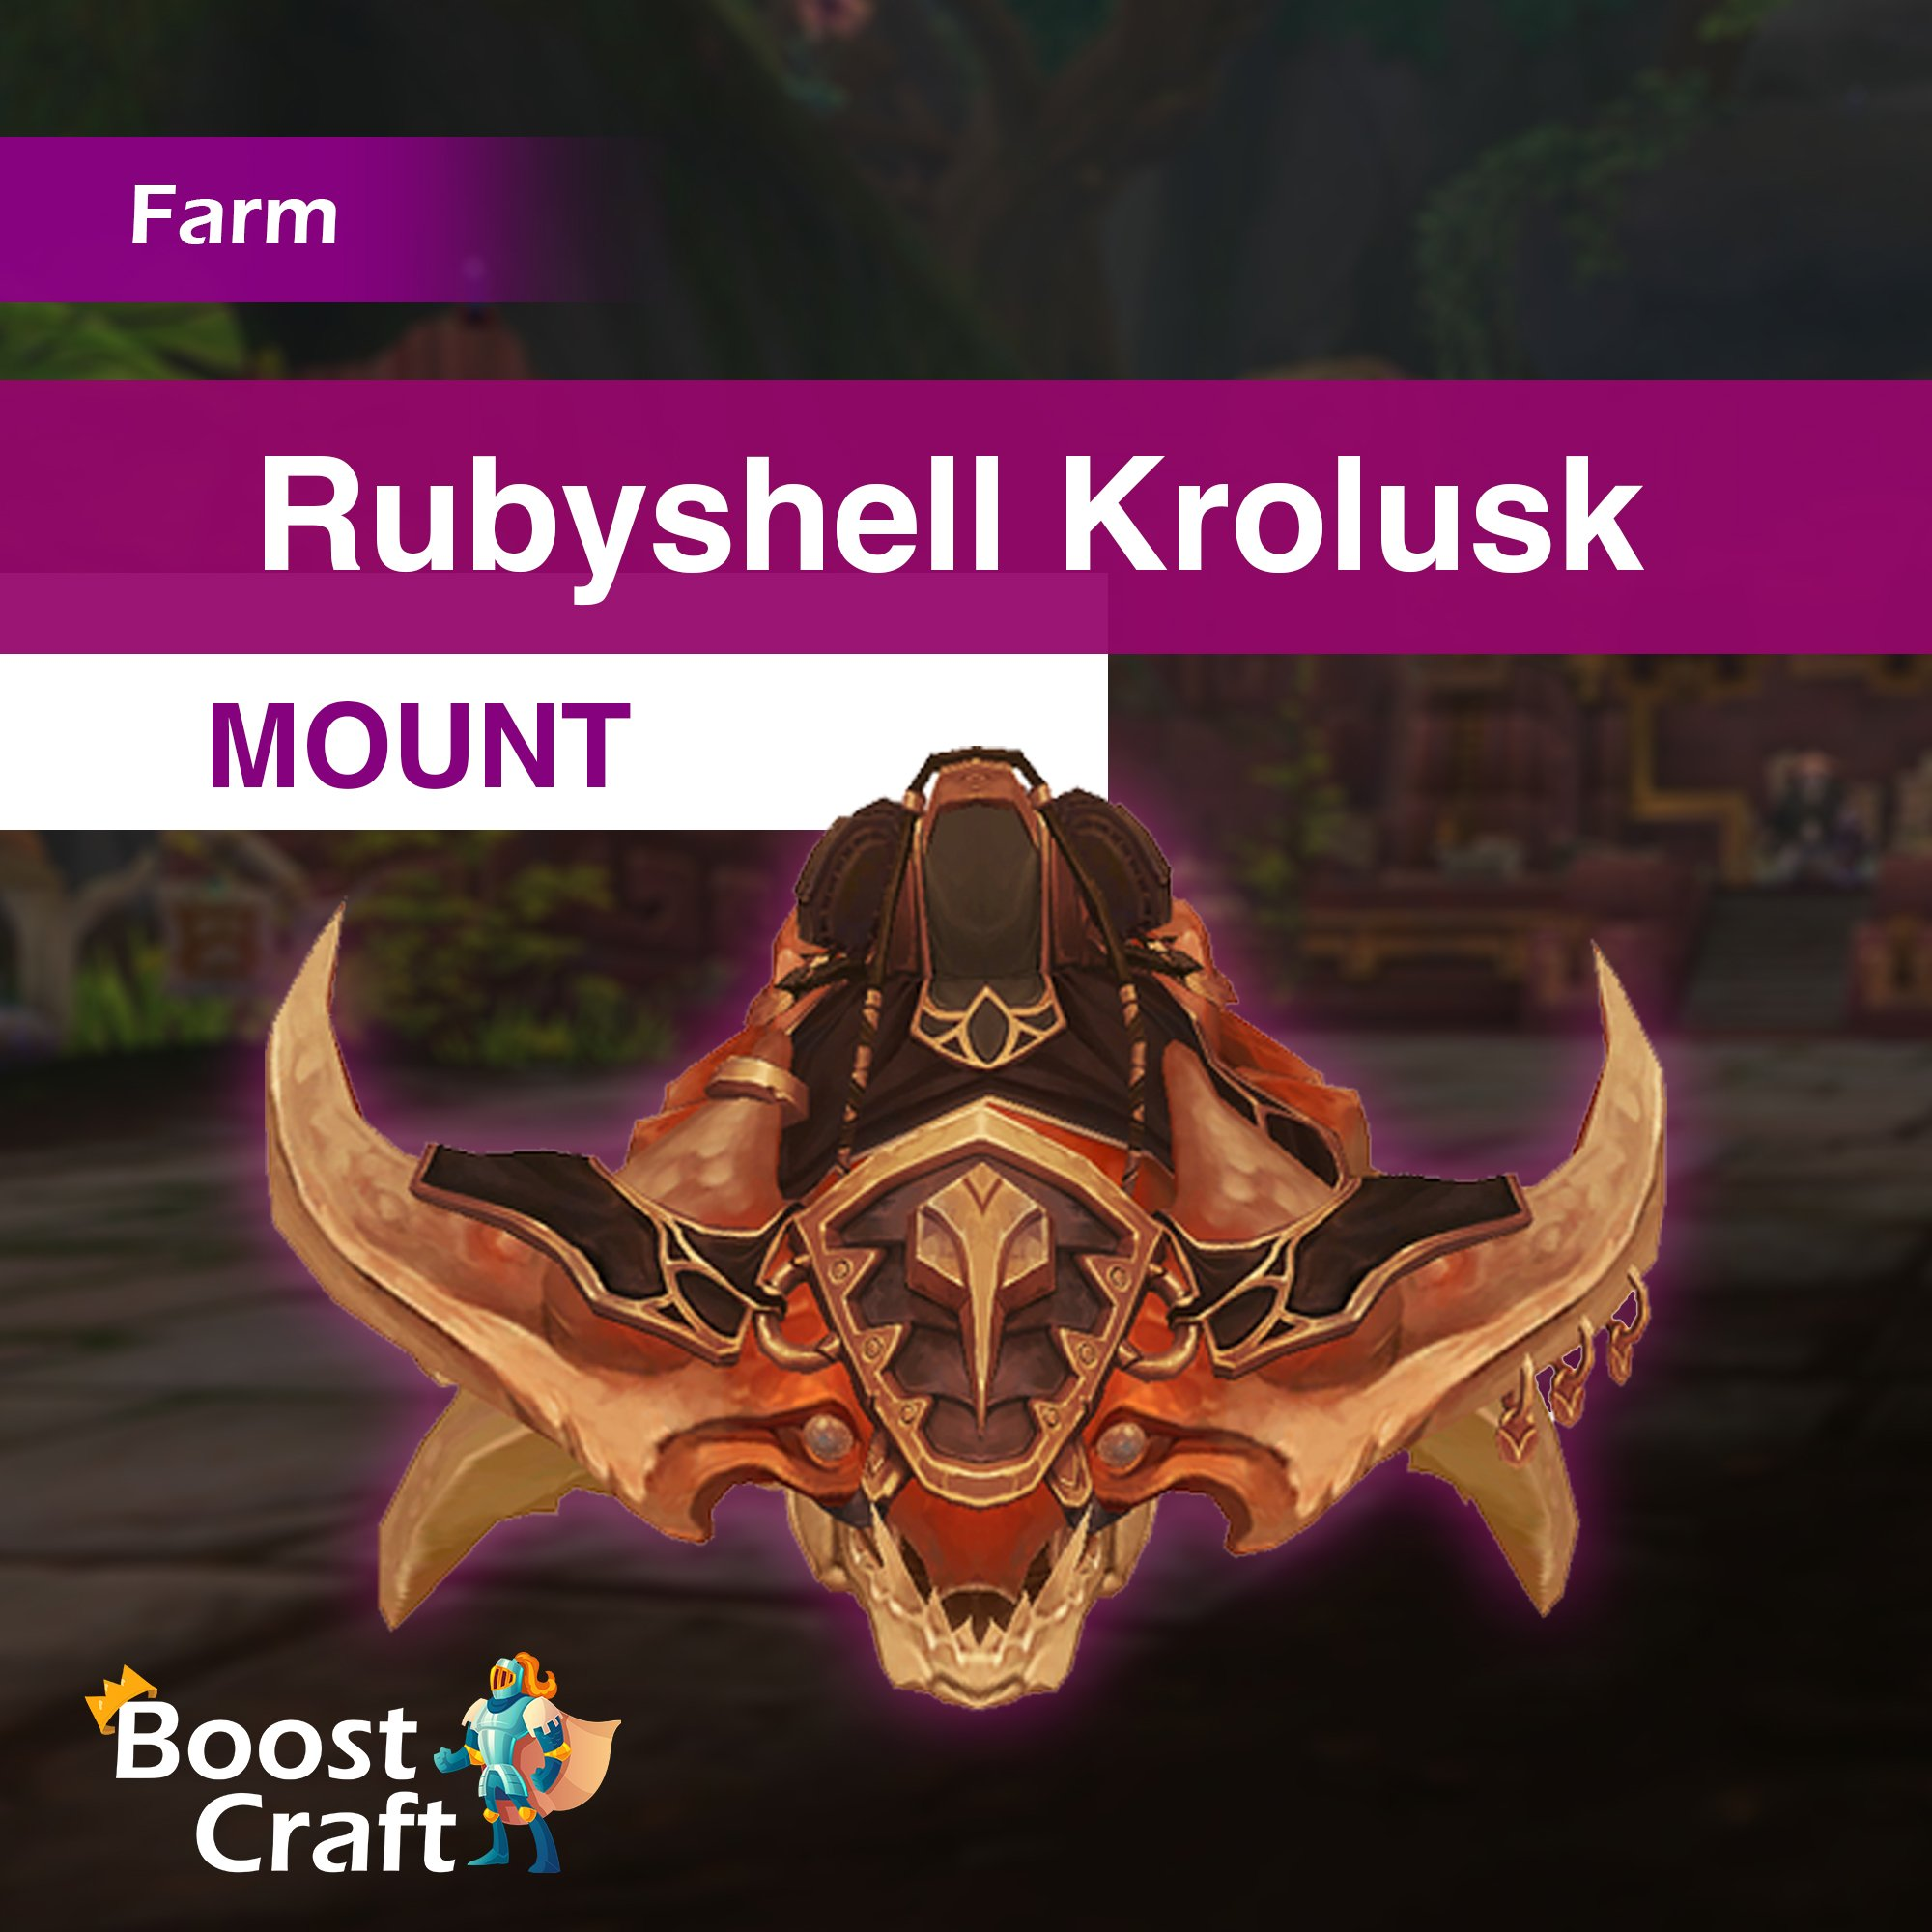 Rubyshell Krolusk Mount – Farm Service